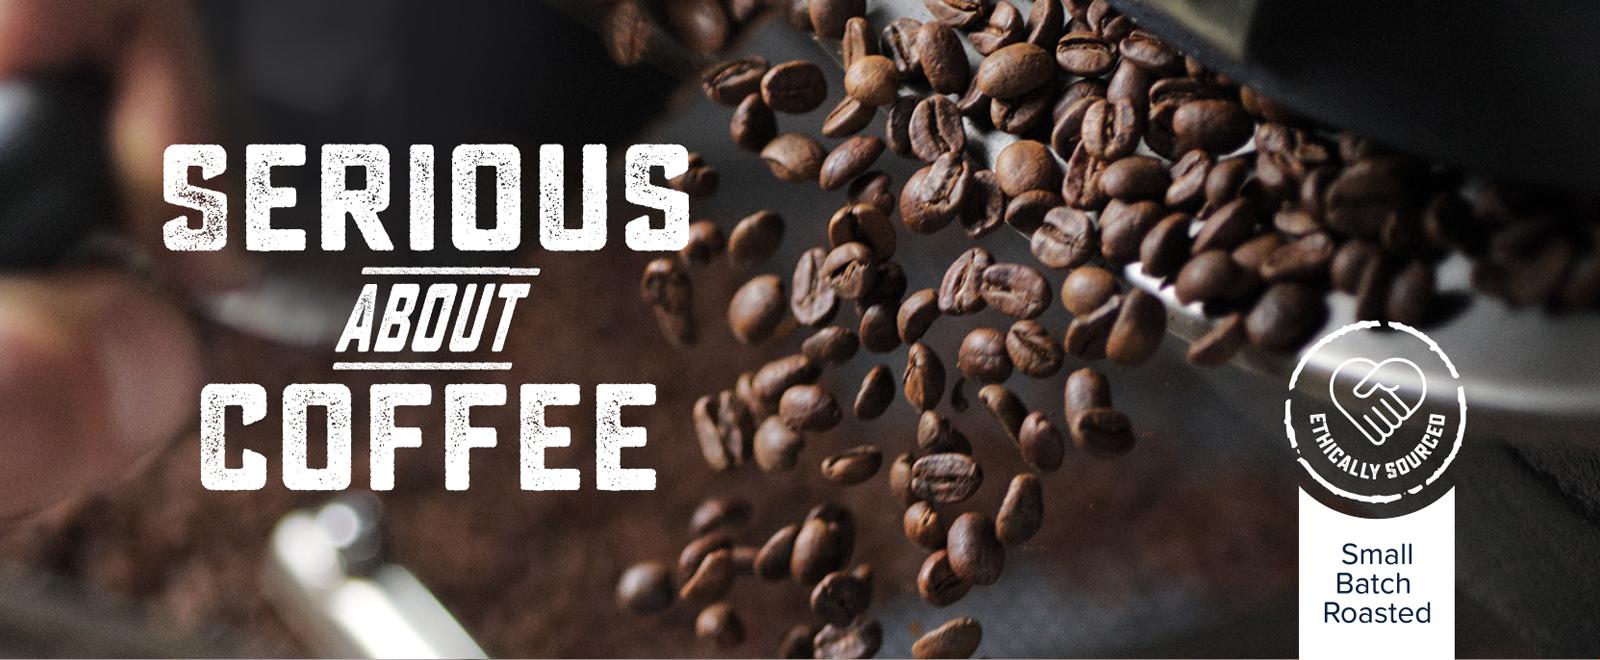 Coffee Lover Rejoice